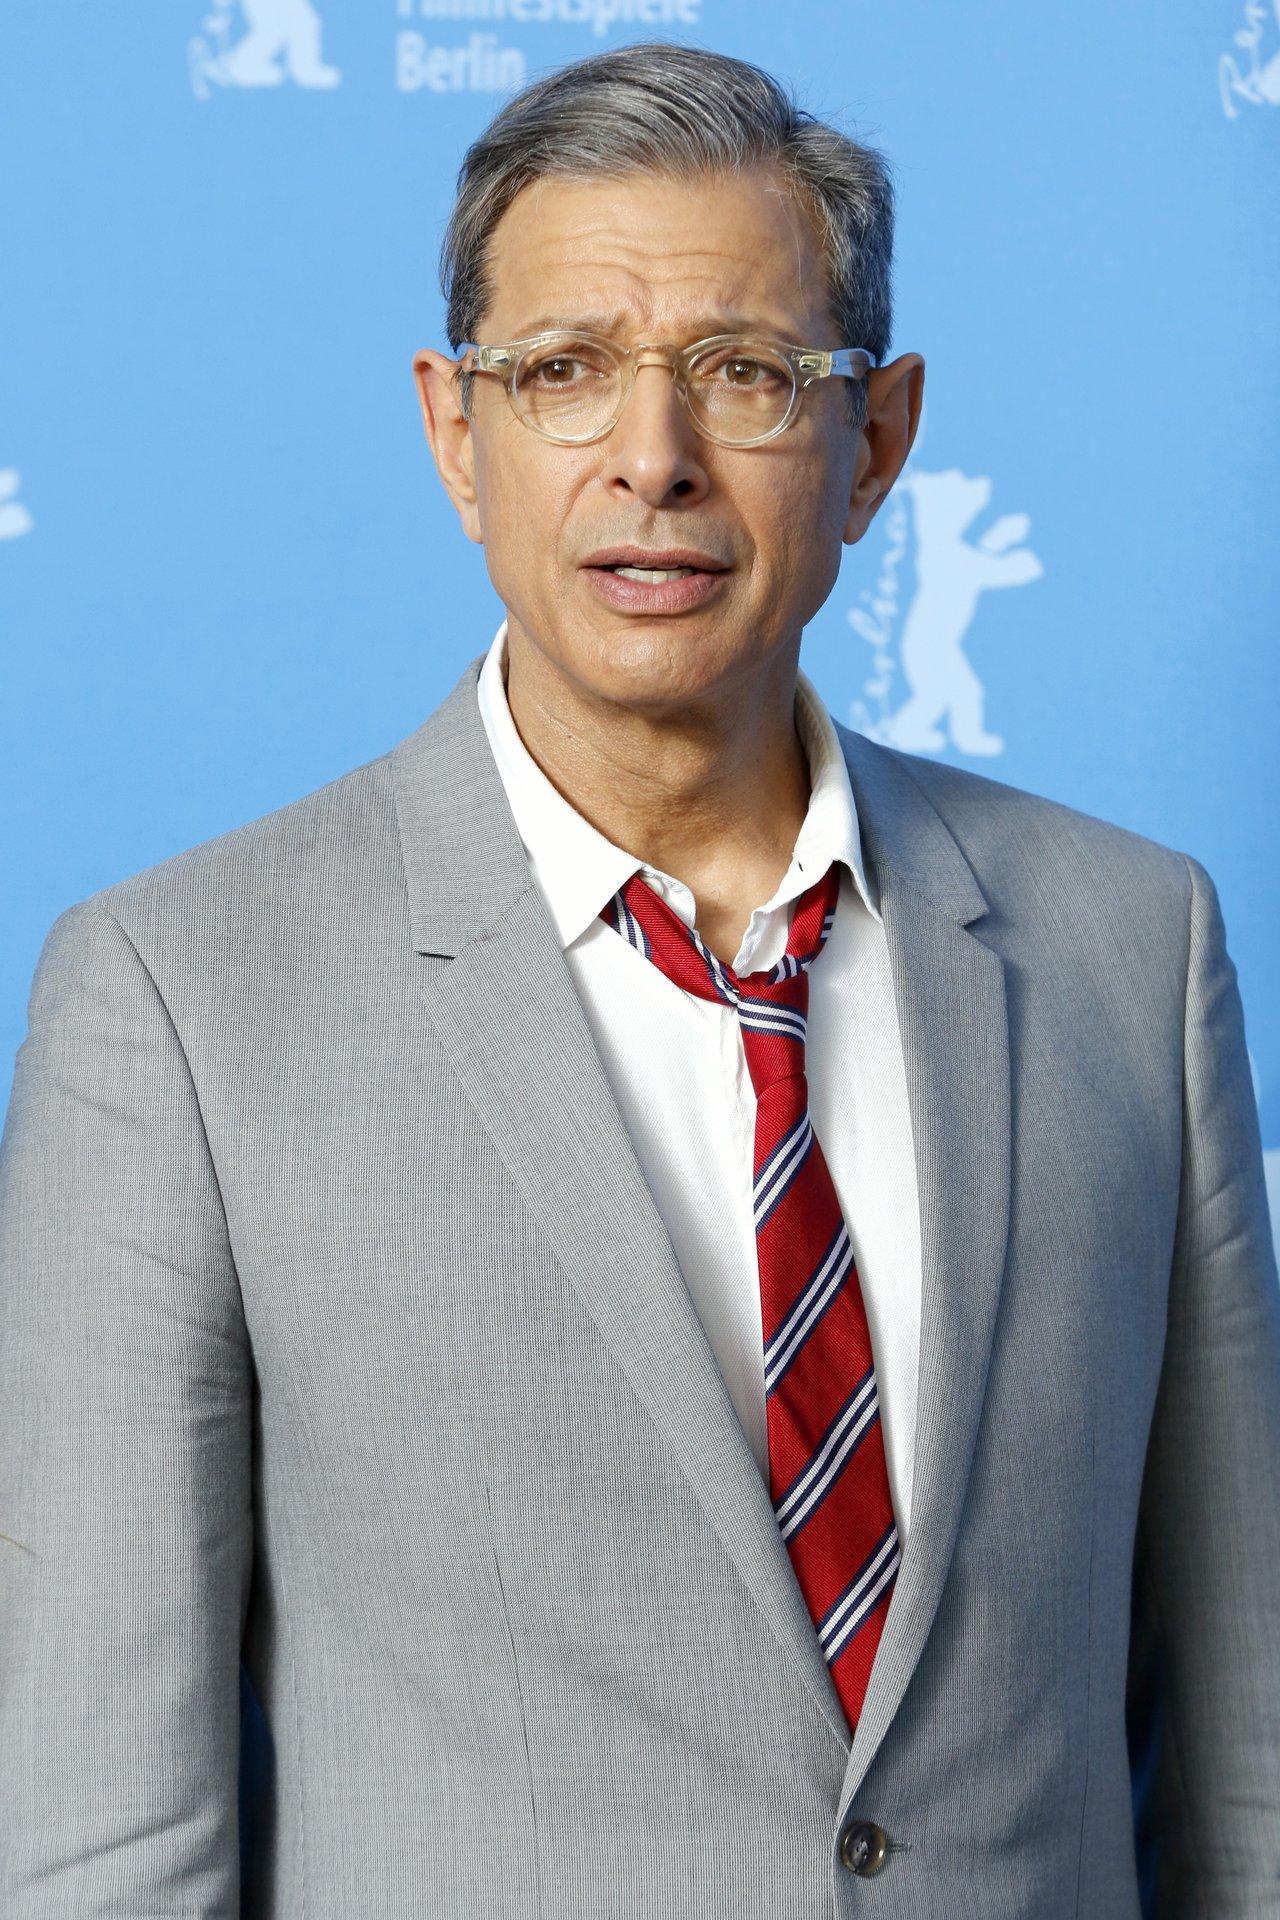 Jeff goldblum 2014